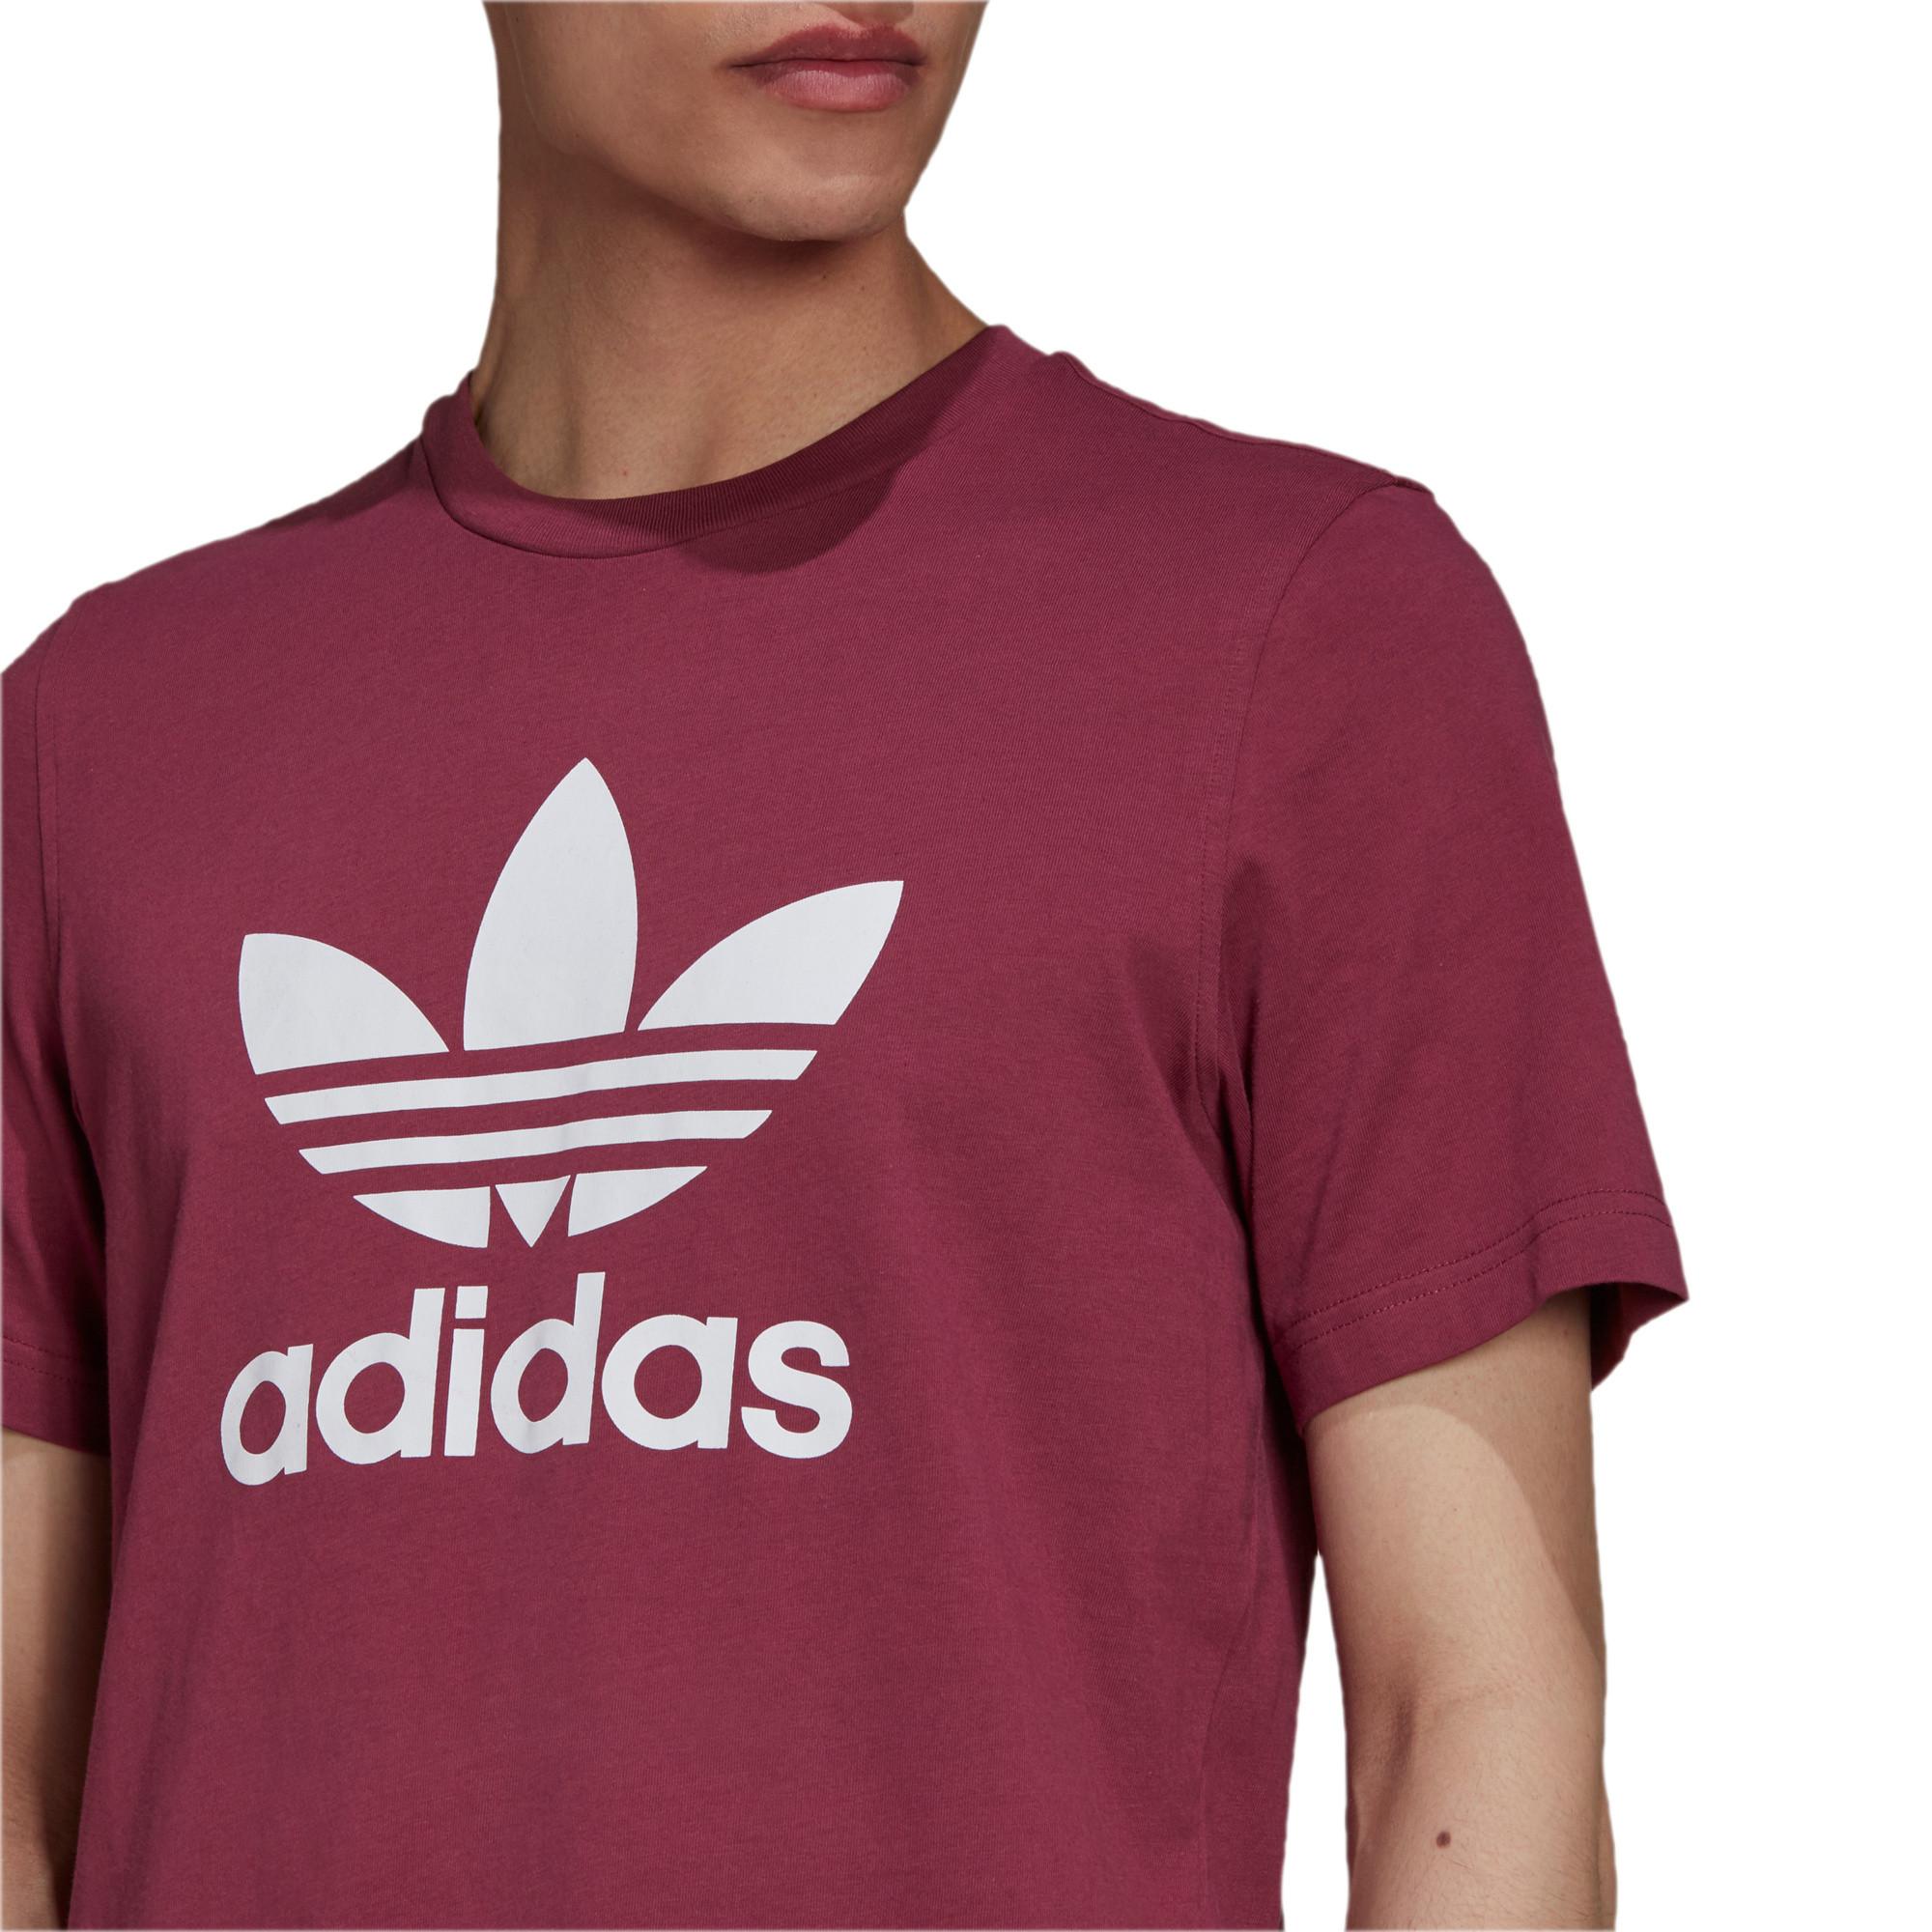 T-shirt uomo adicolor Classics Trefoil, Bianco/Rosso, large image number 4